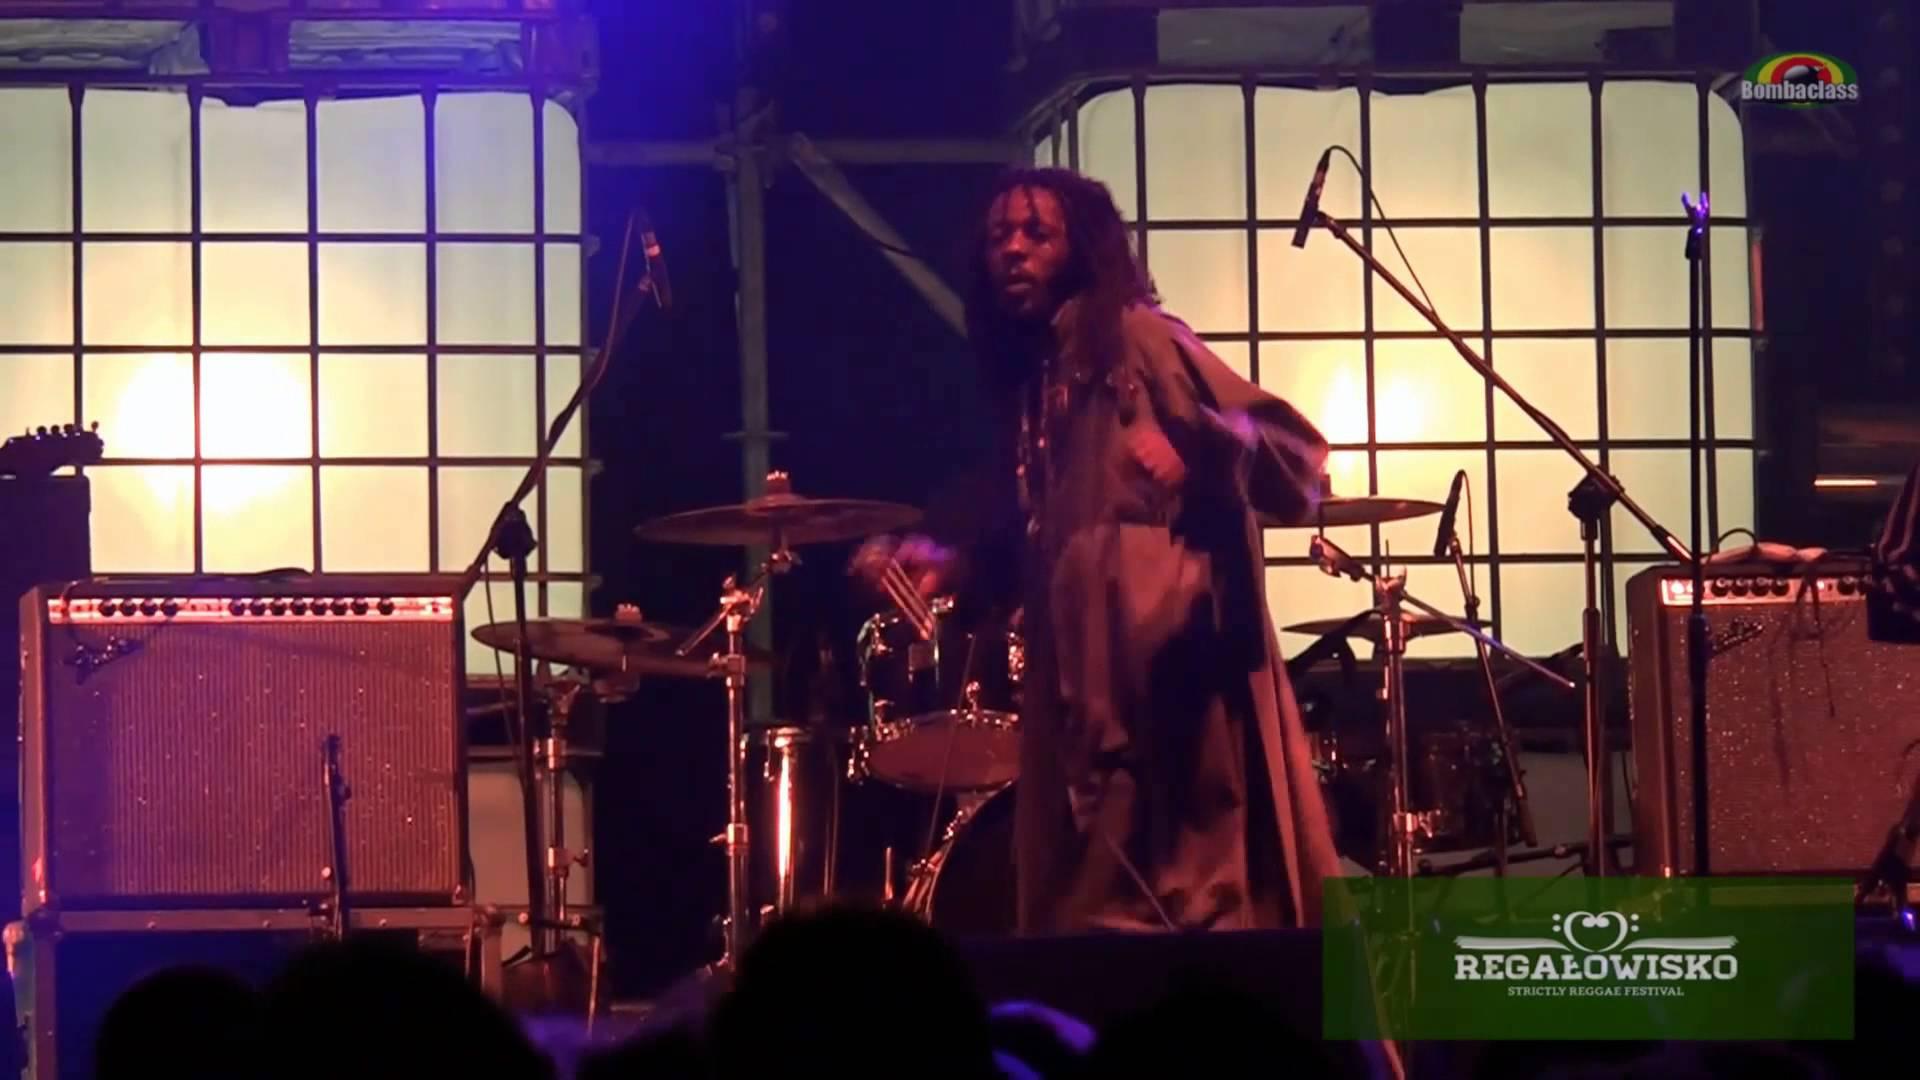 The Gladiators feat. Droop Lion - Hello Carol @ Regałowisko Bielawa Reggae Festival 2014 [8/23/2014]